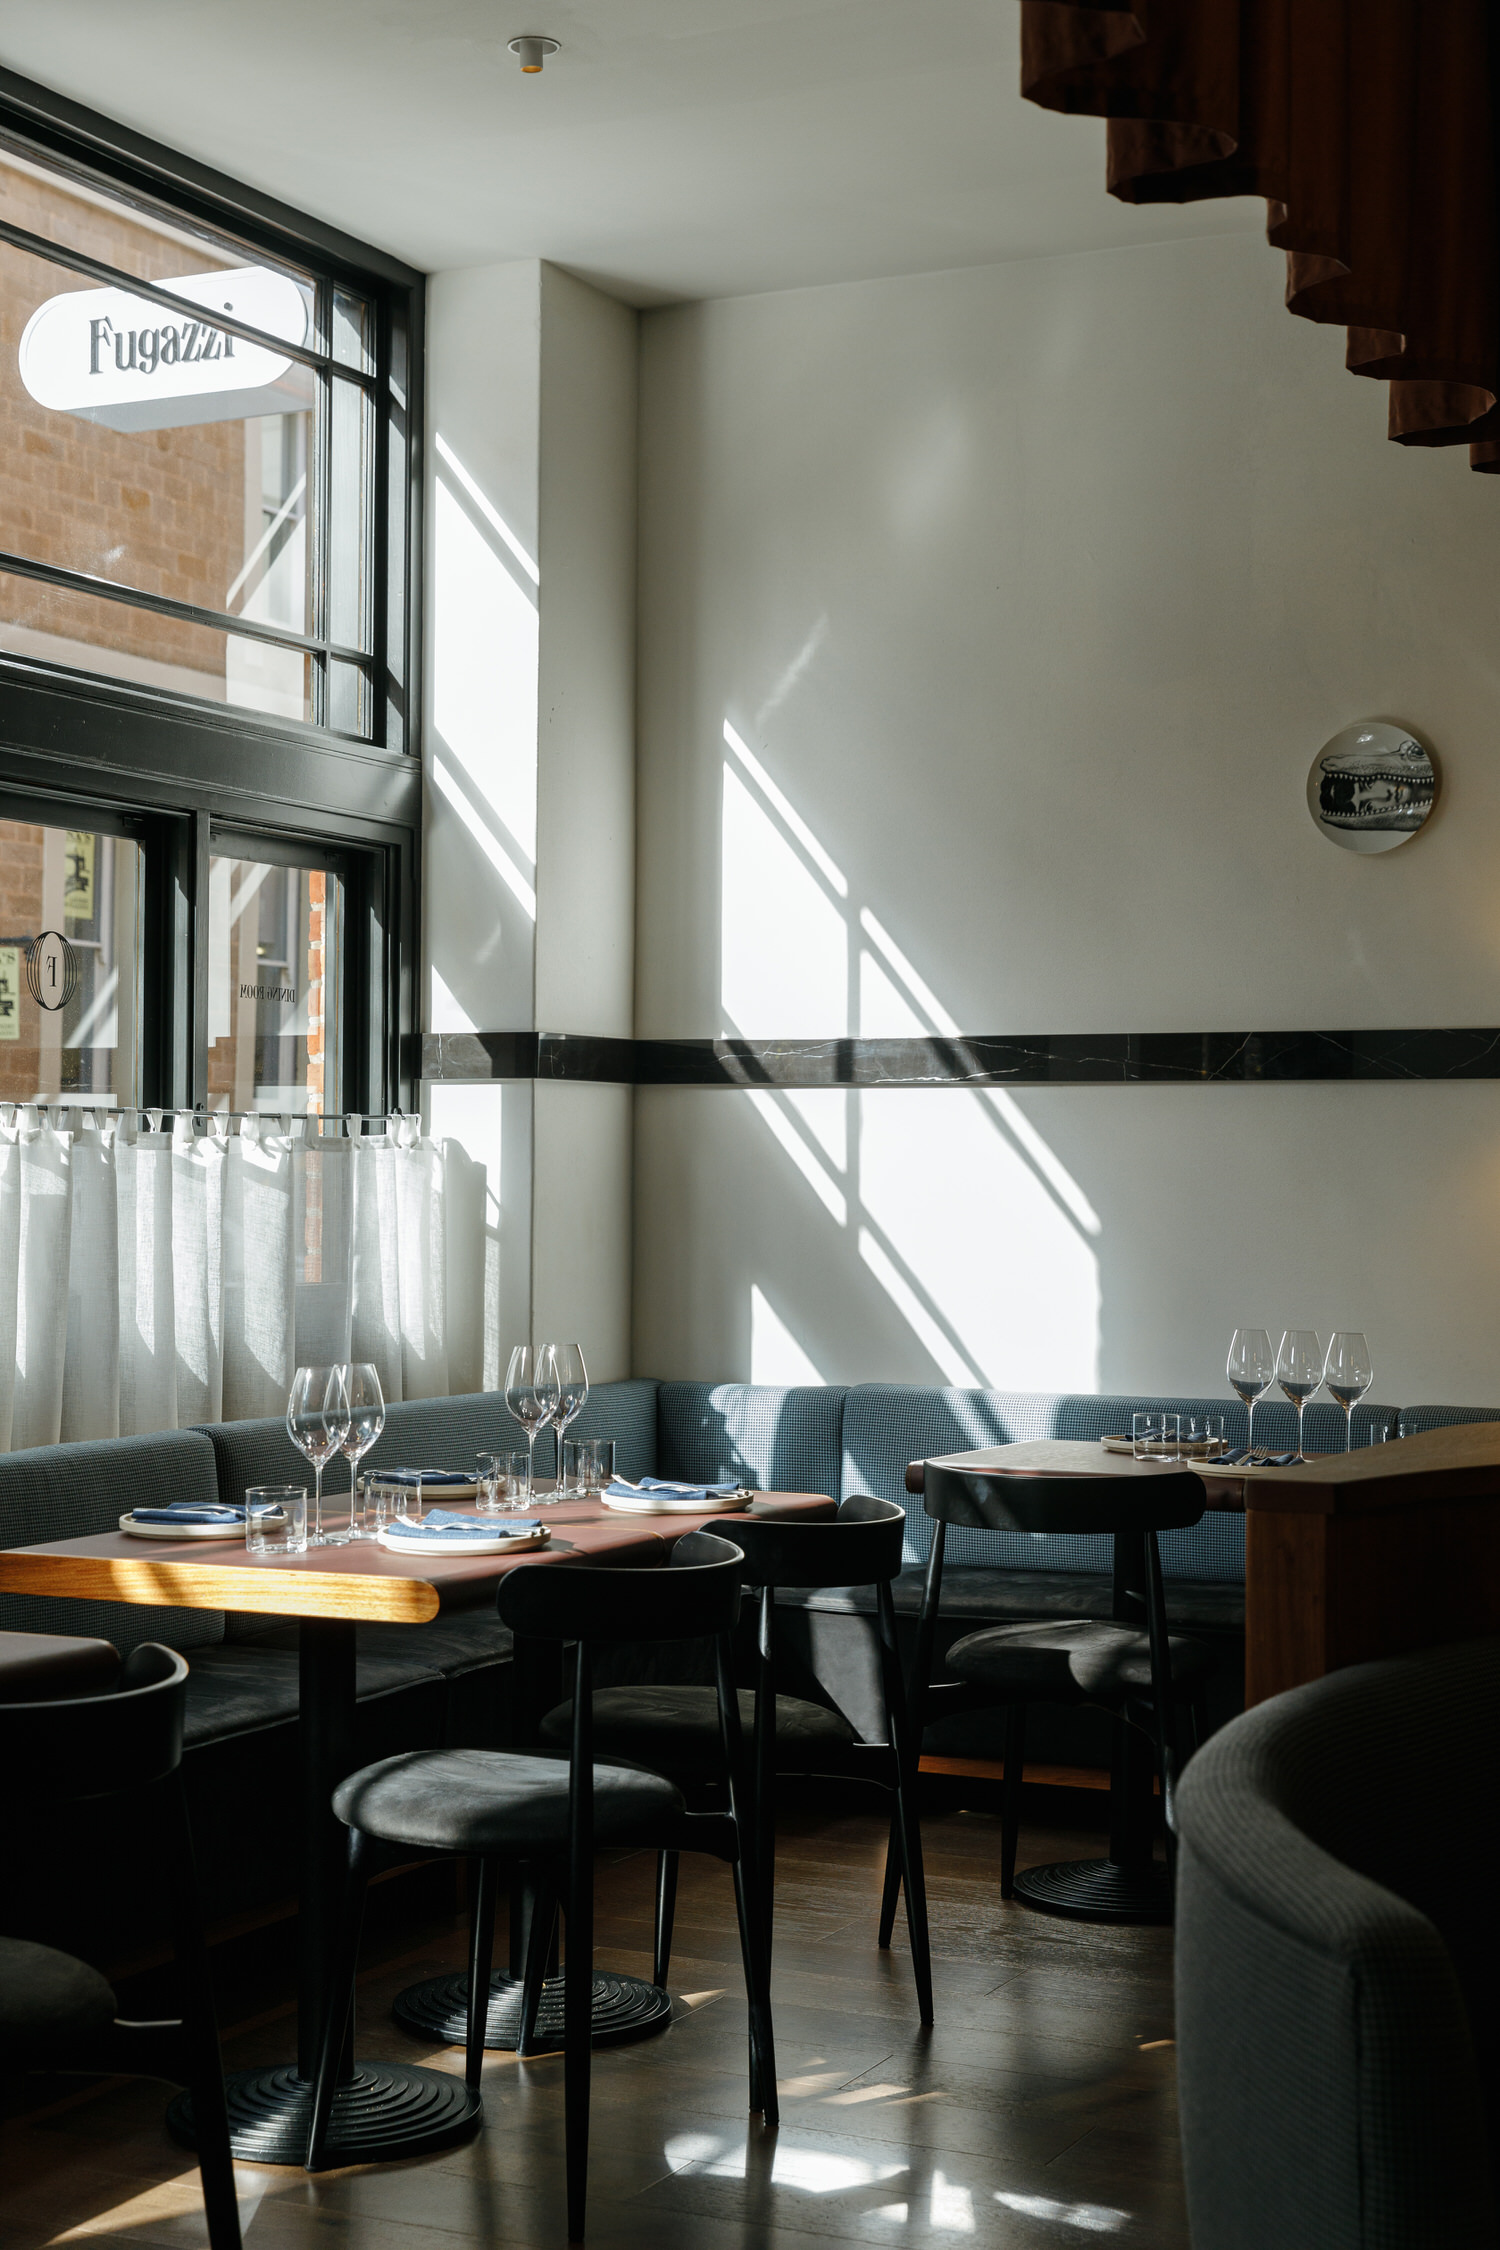 Studio Gram Fugazzi Adelaide Restaurant Bar Photo Jonathan Vdk Yellowtrace 22